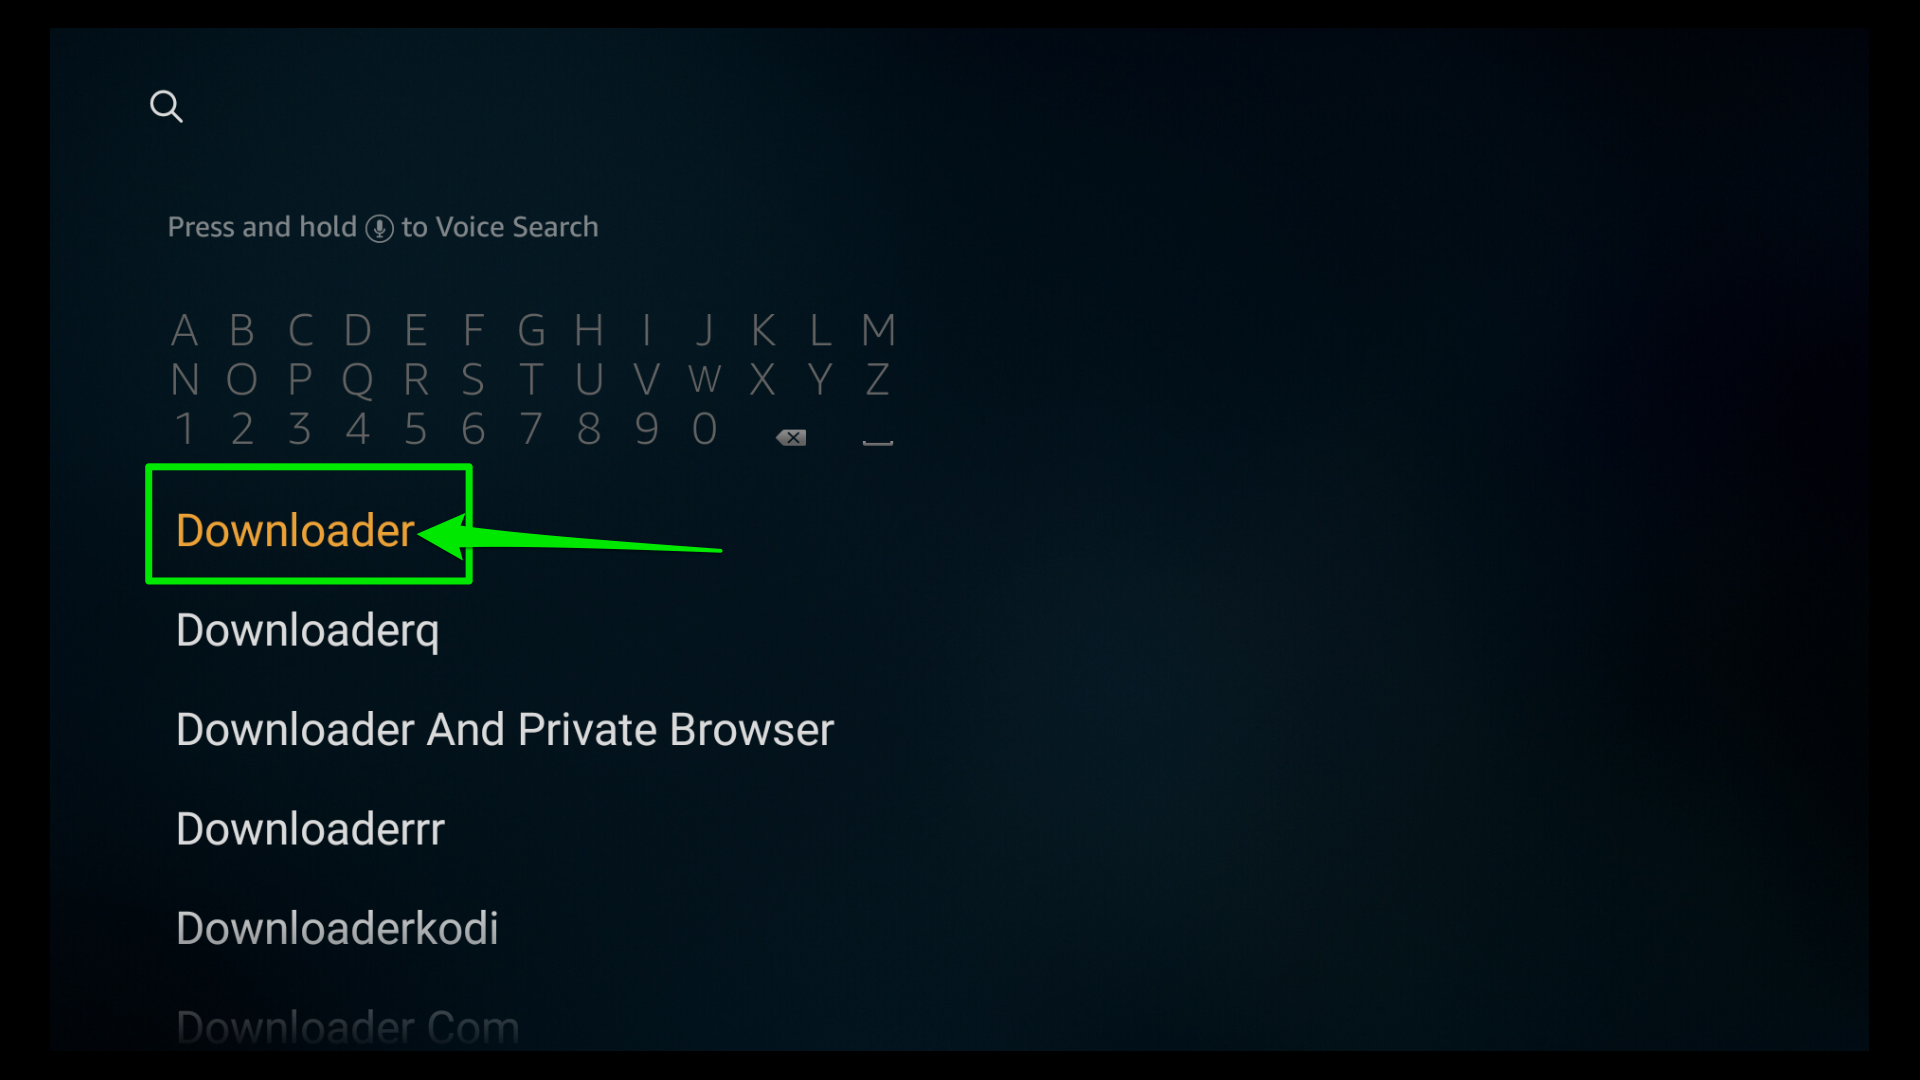 How To Download Ipvanish On Firestick